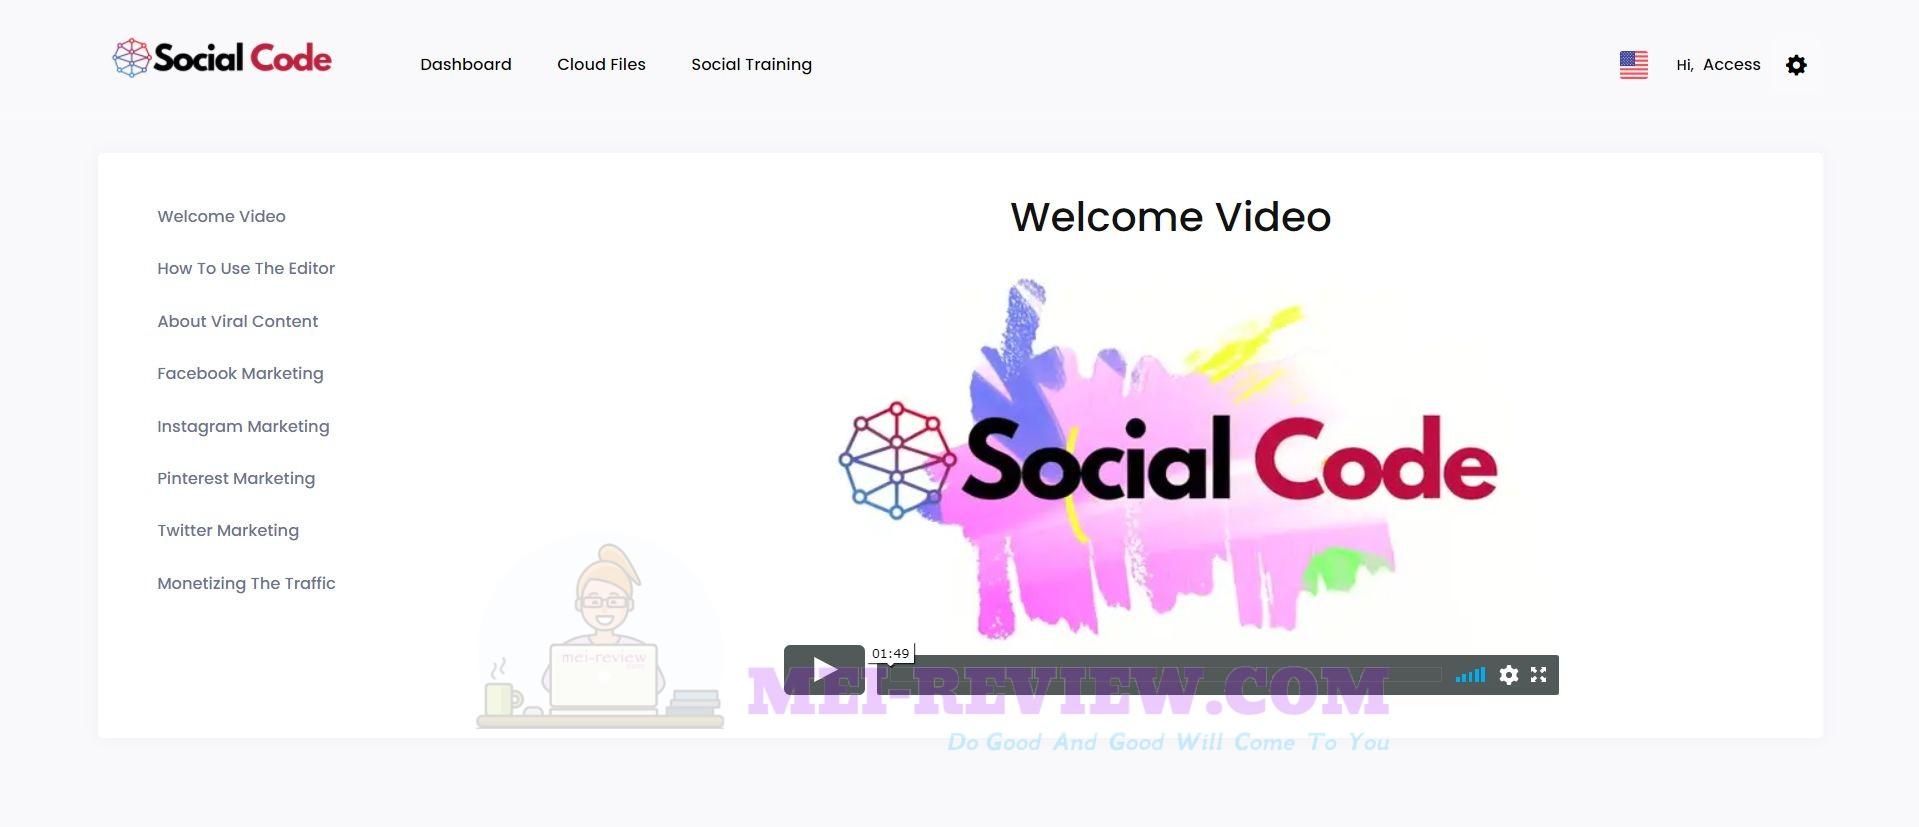 SocialCode-marketing-training